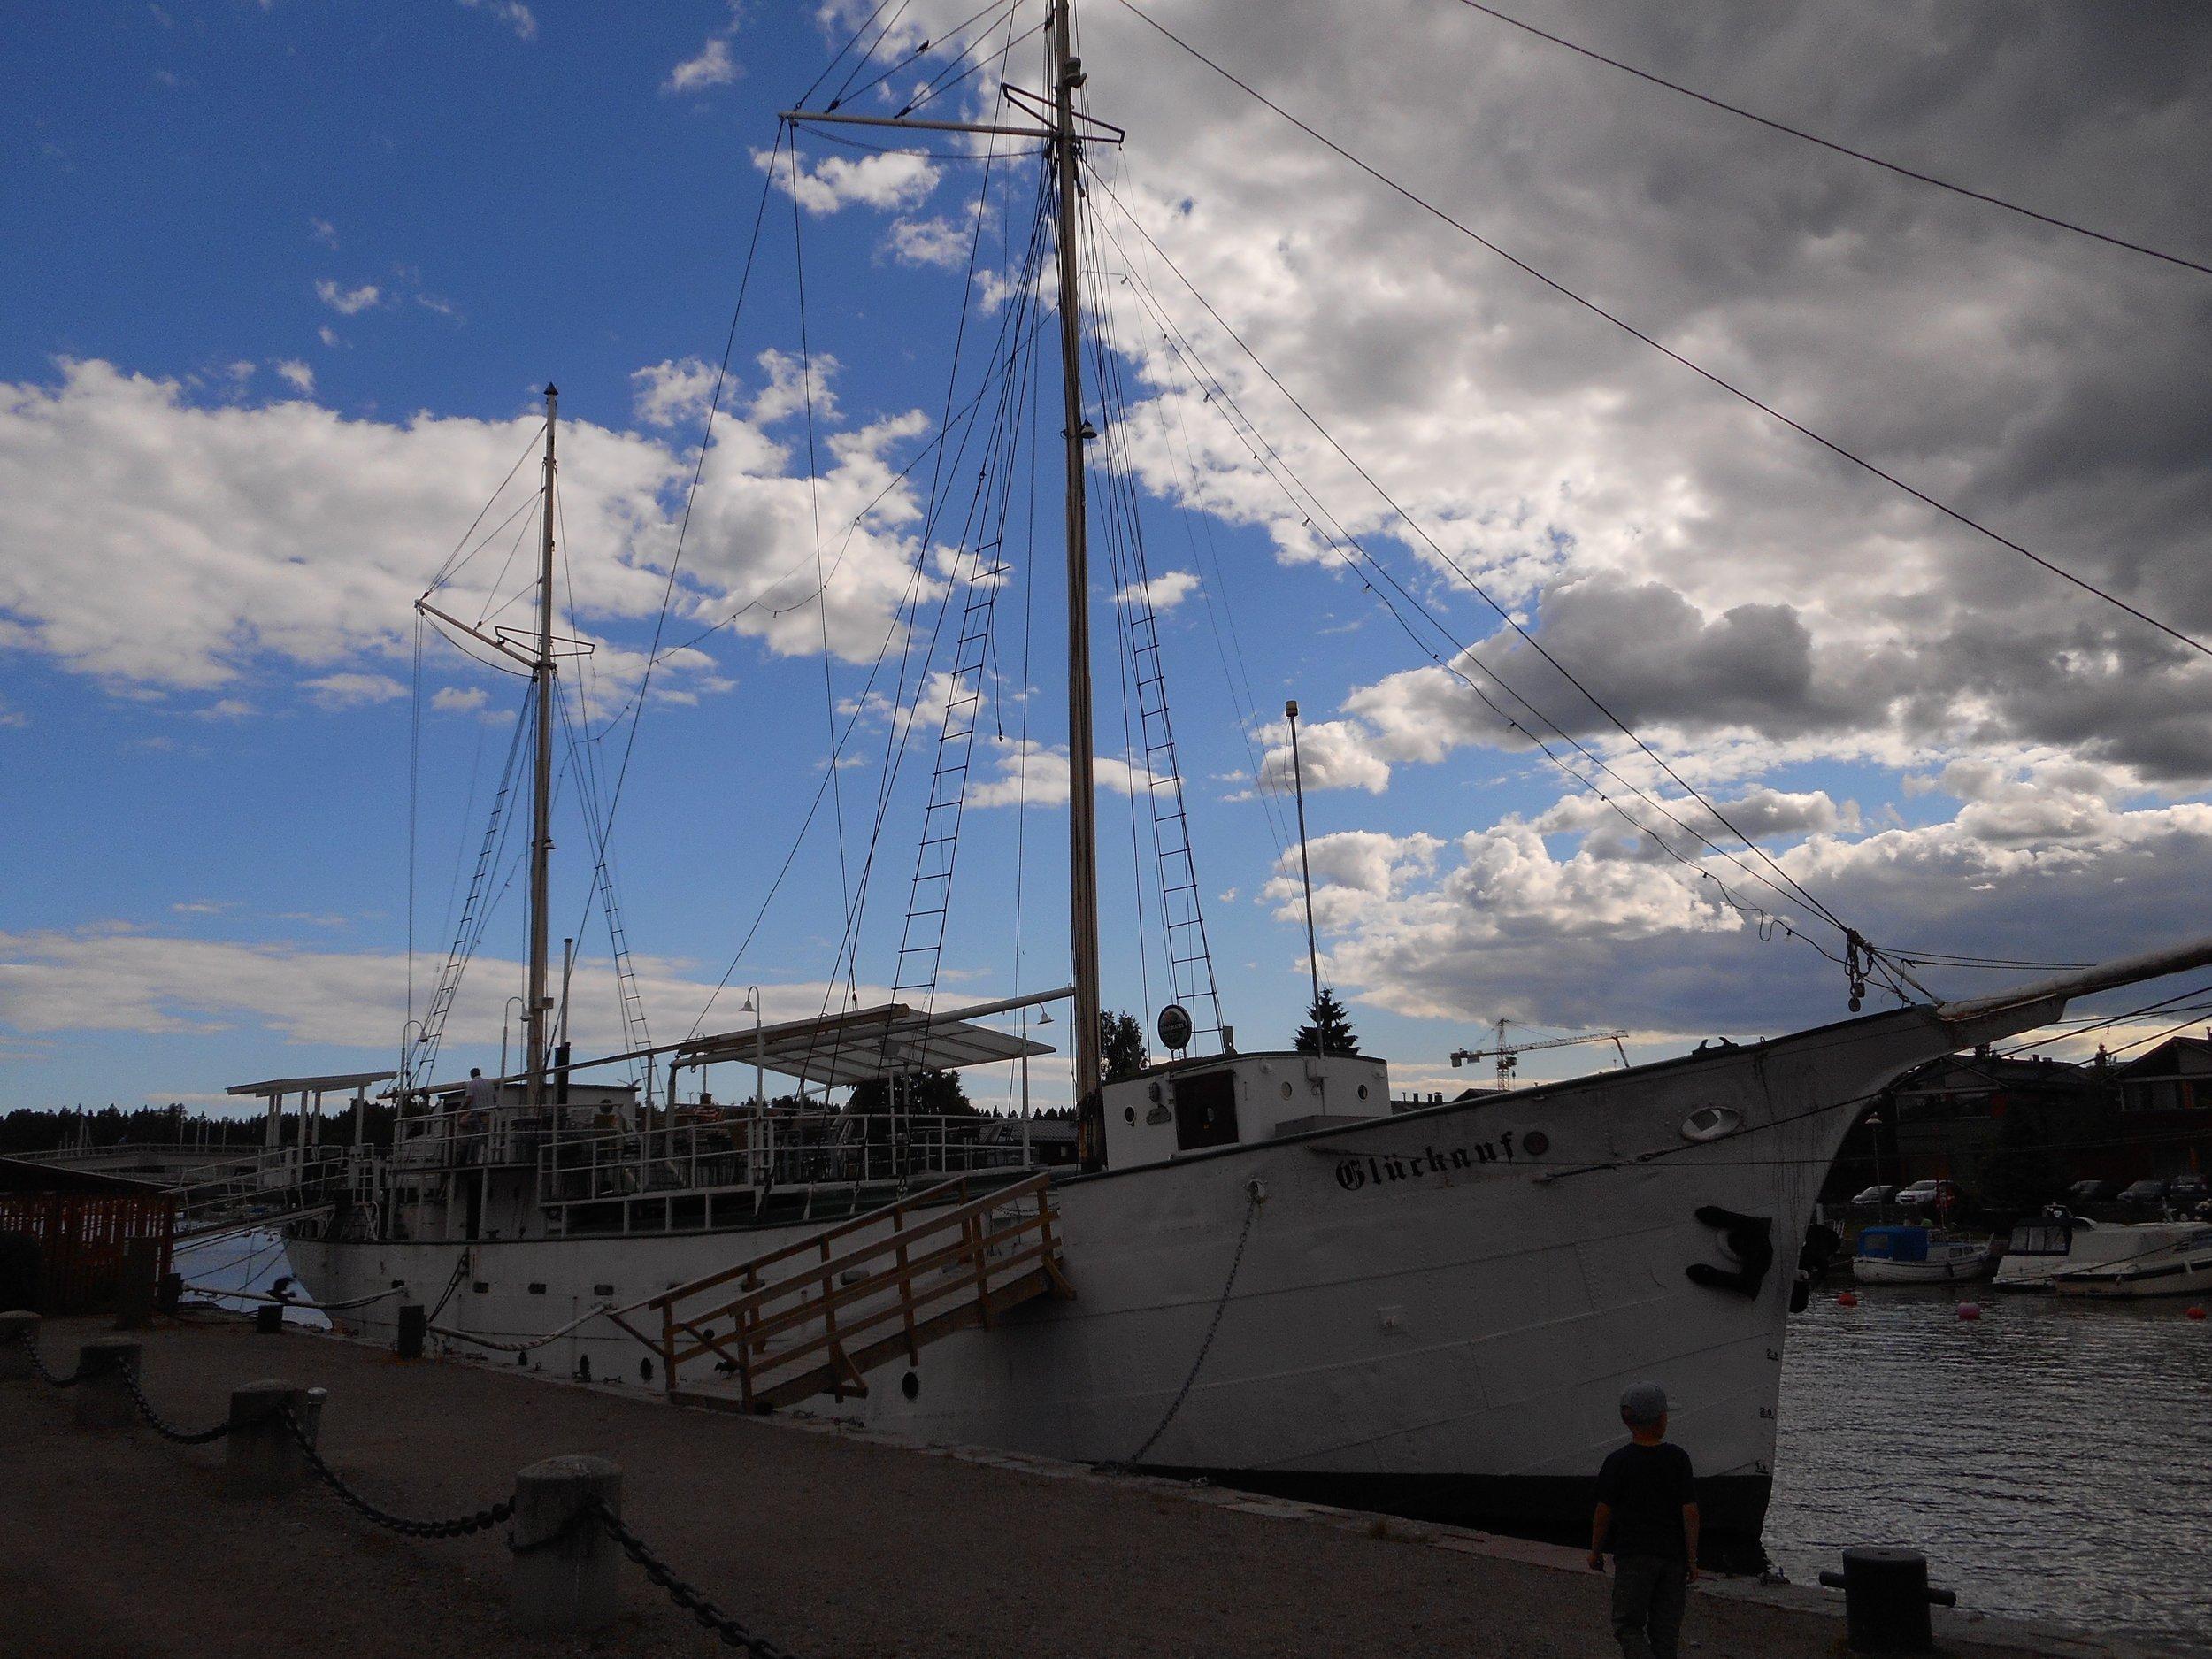 Old sailing ship in Porvoo harbour